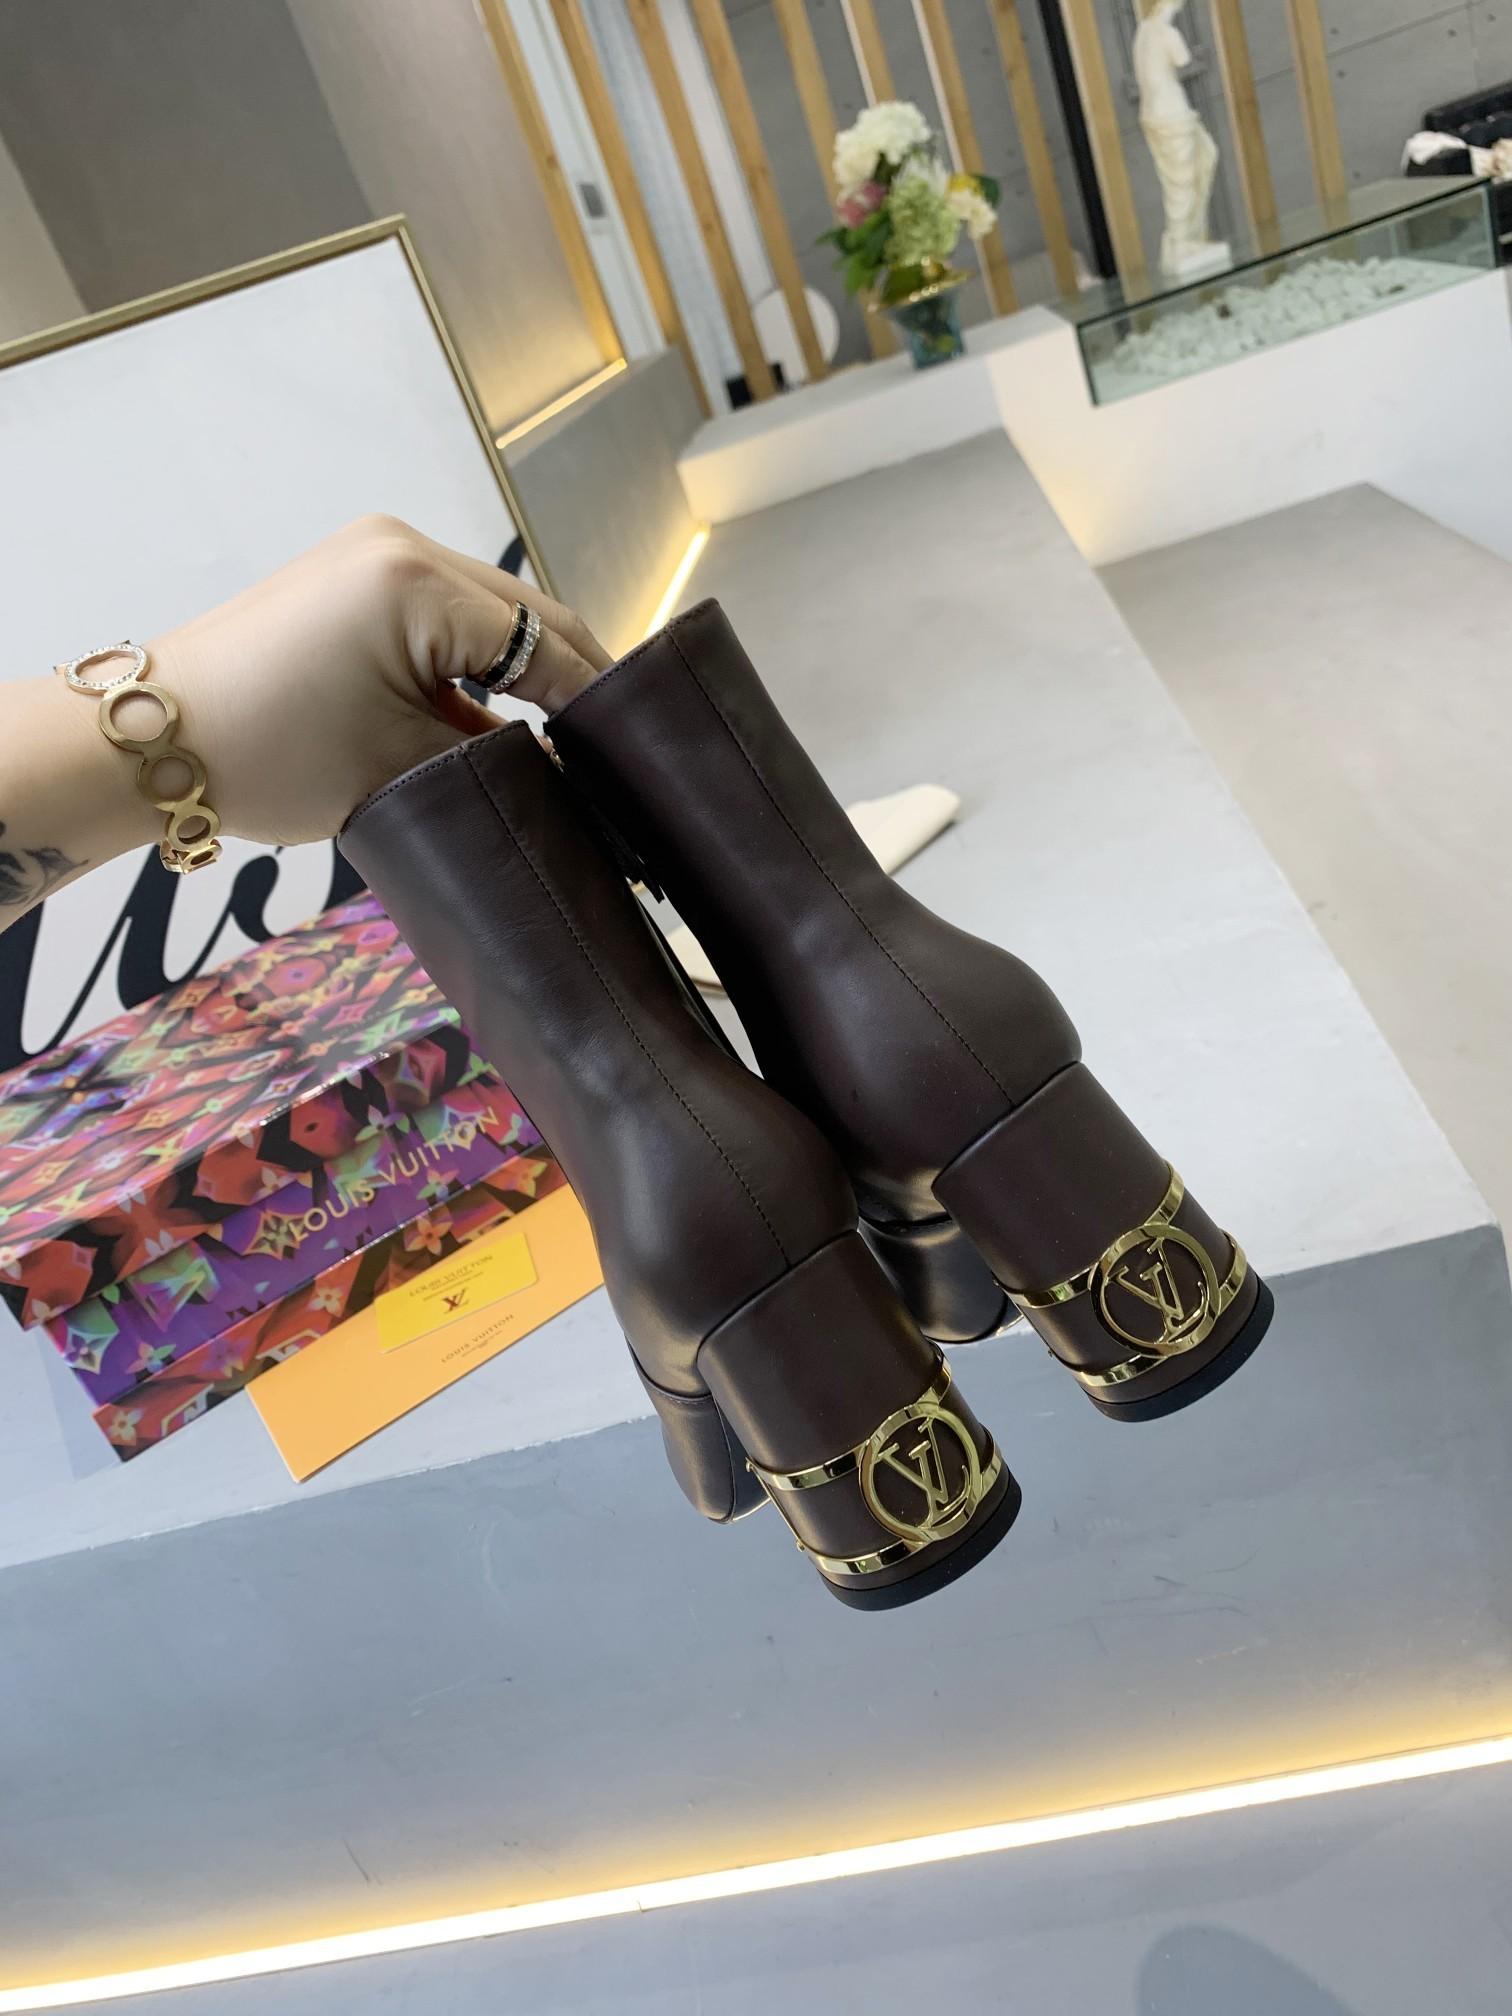 LV2020秋冬新款短靴爱上牛仔裤,